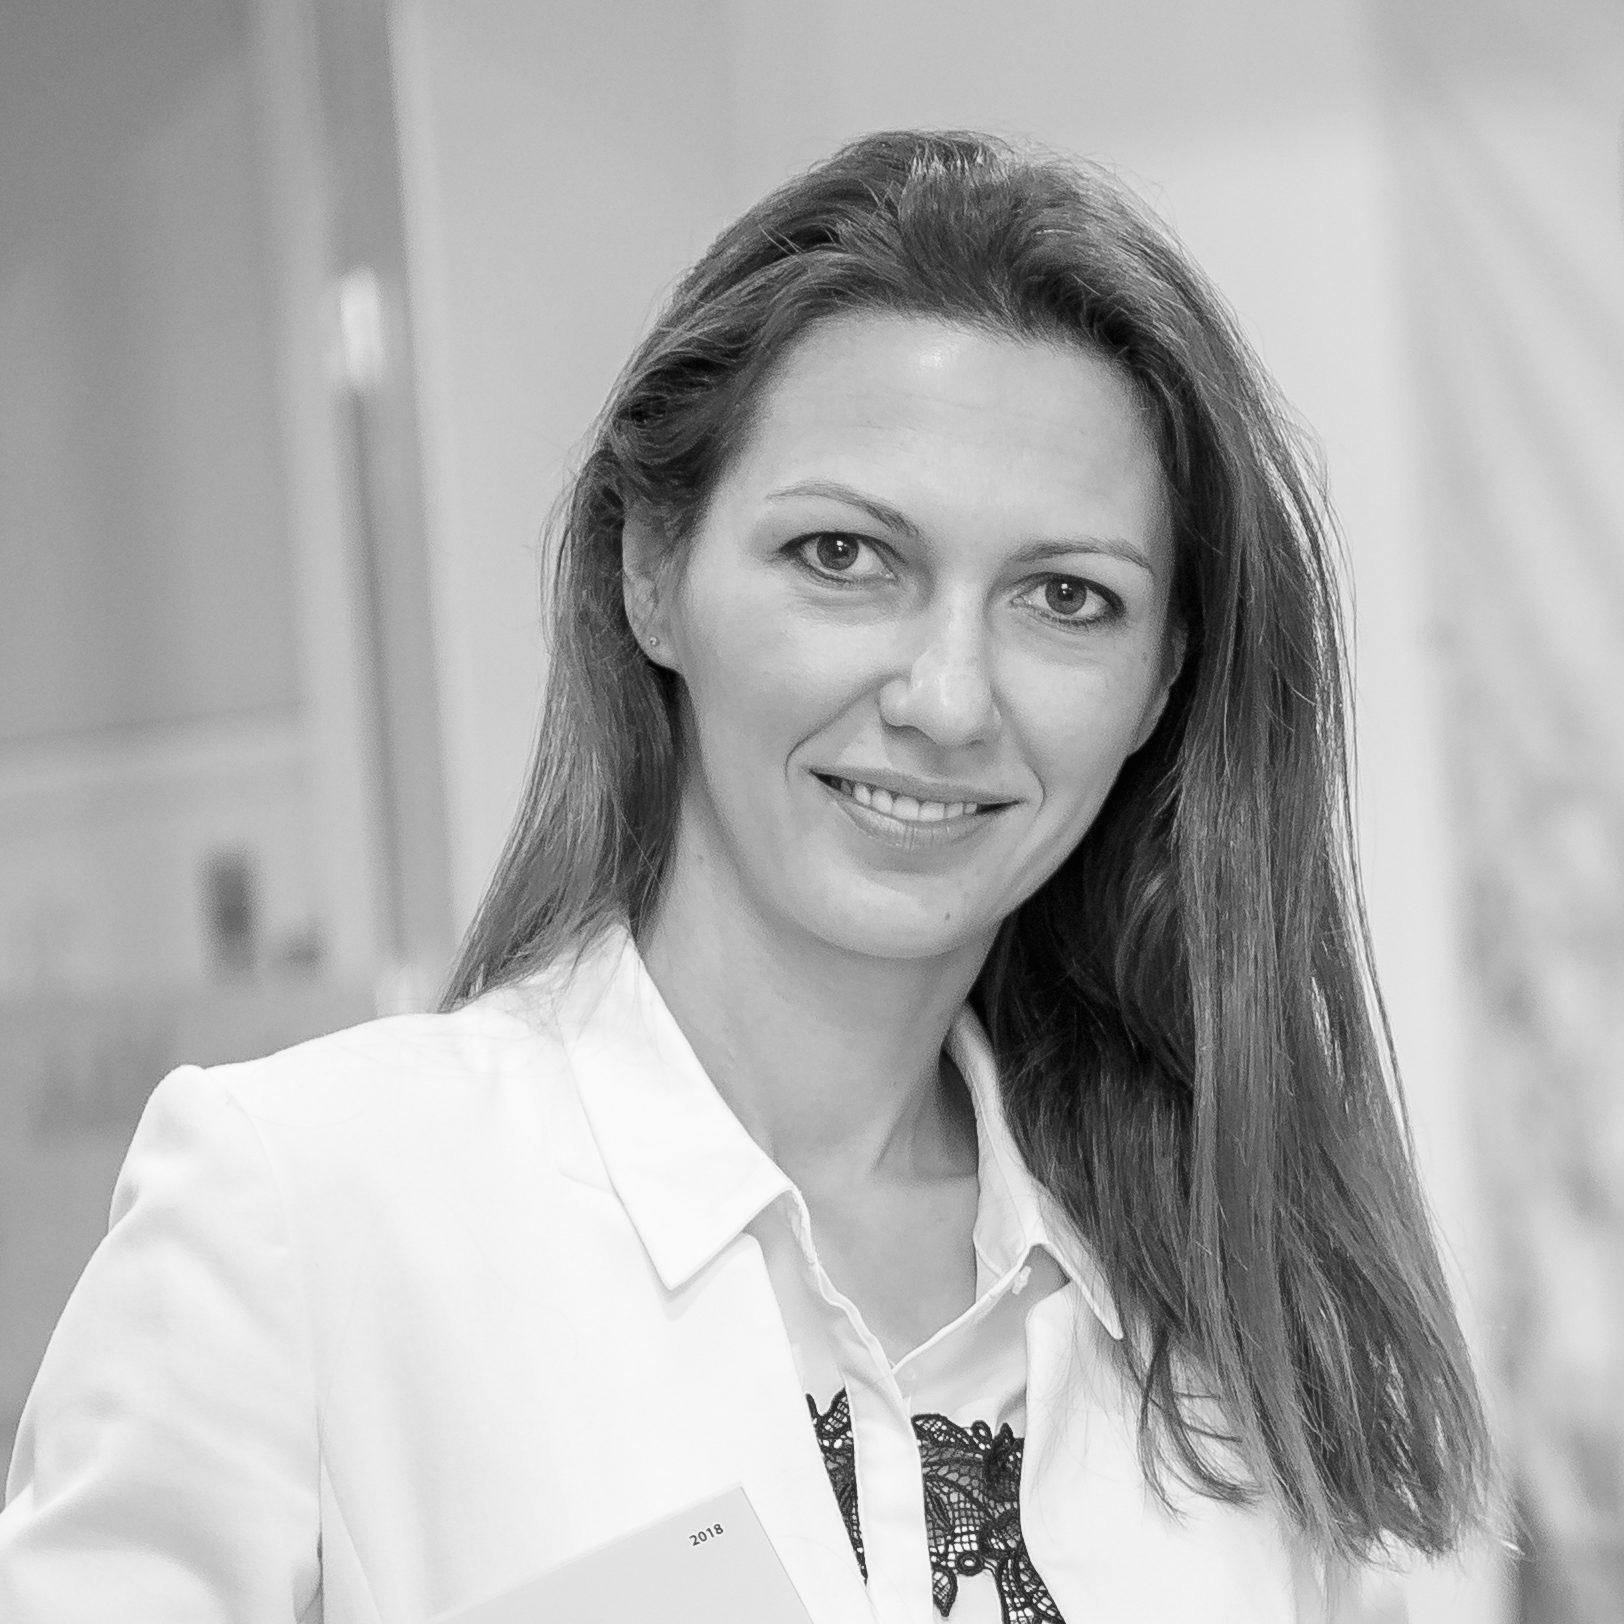 Daria Khnykina